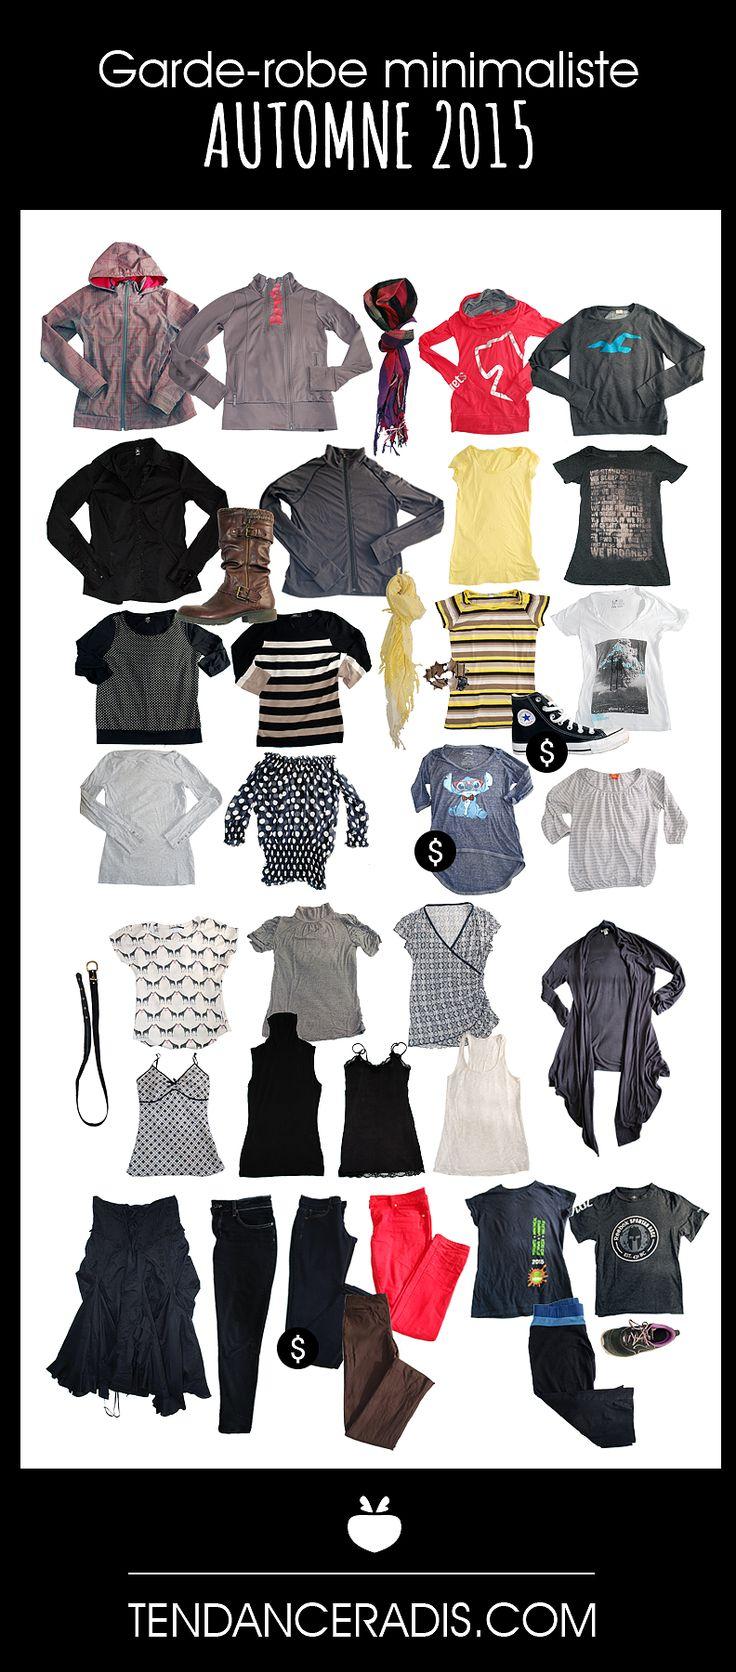 On a test le projet 333 la garde robe minimaliste for Minimalisme rangement